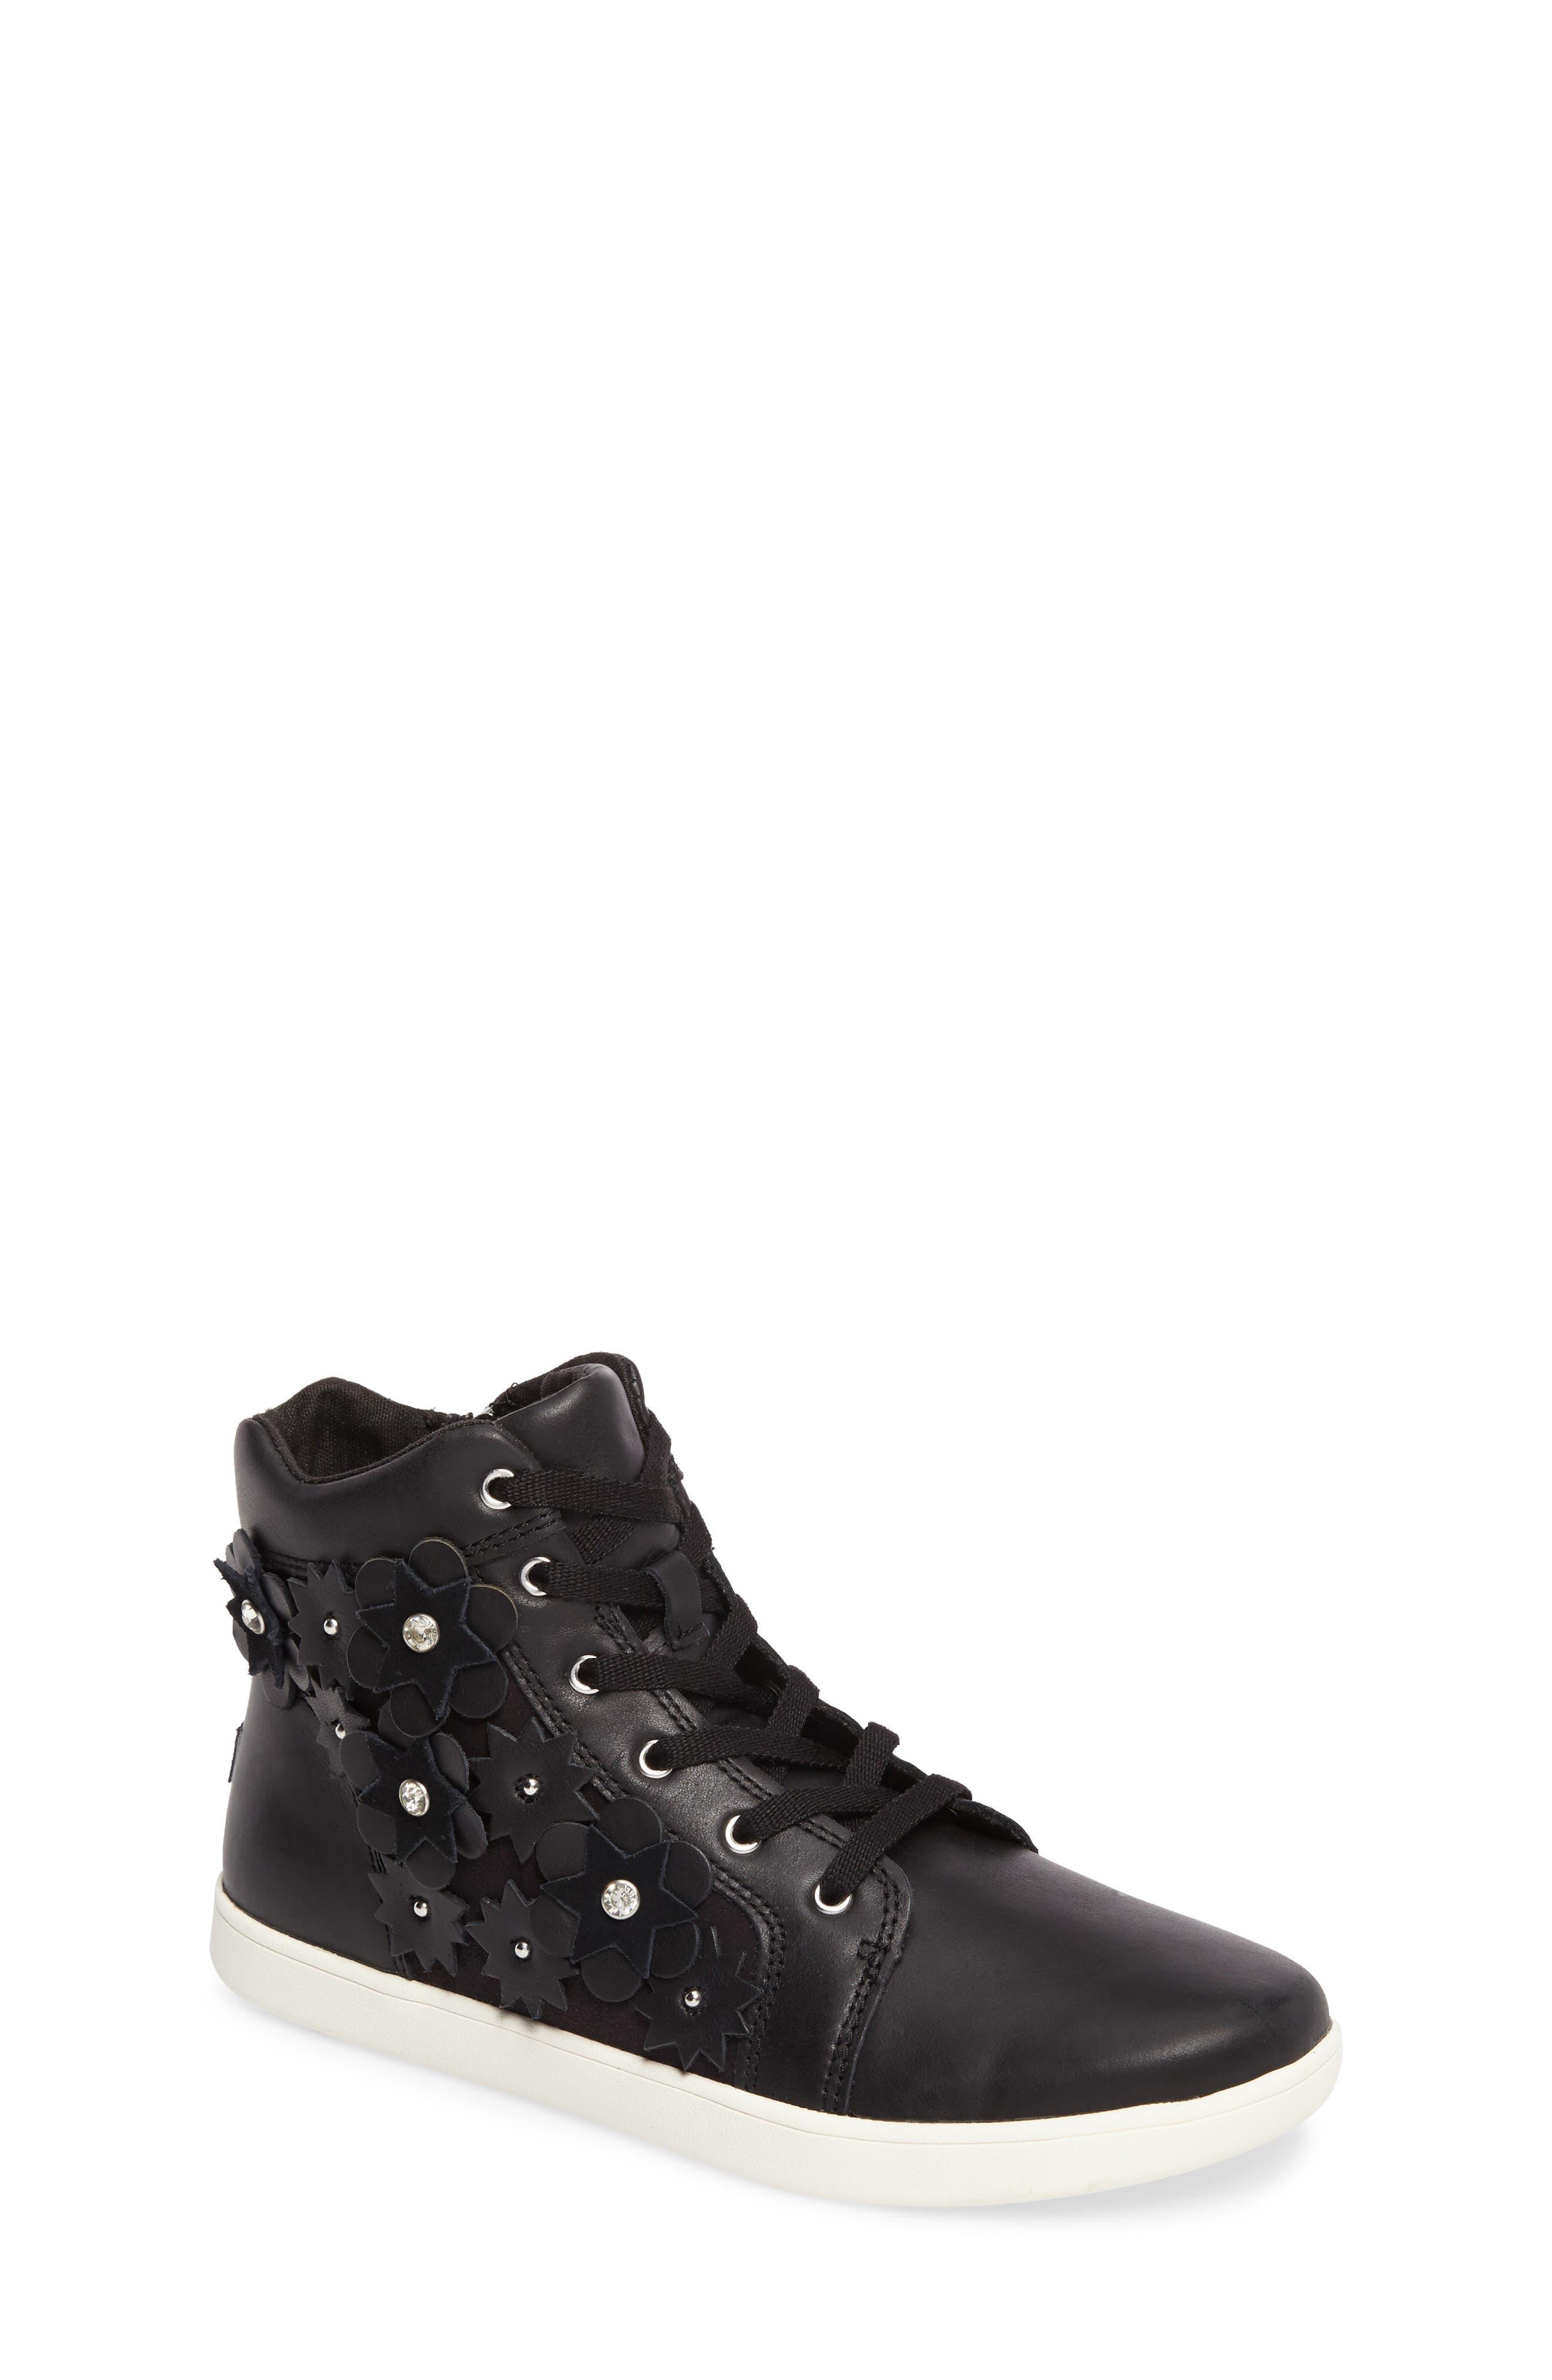 Schyler Petal Embellished High Top Sneaker,                             Main thumbnail 1, color,                             001